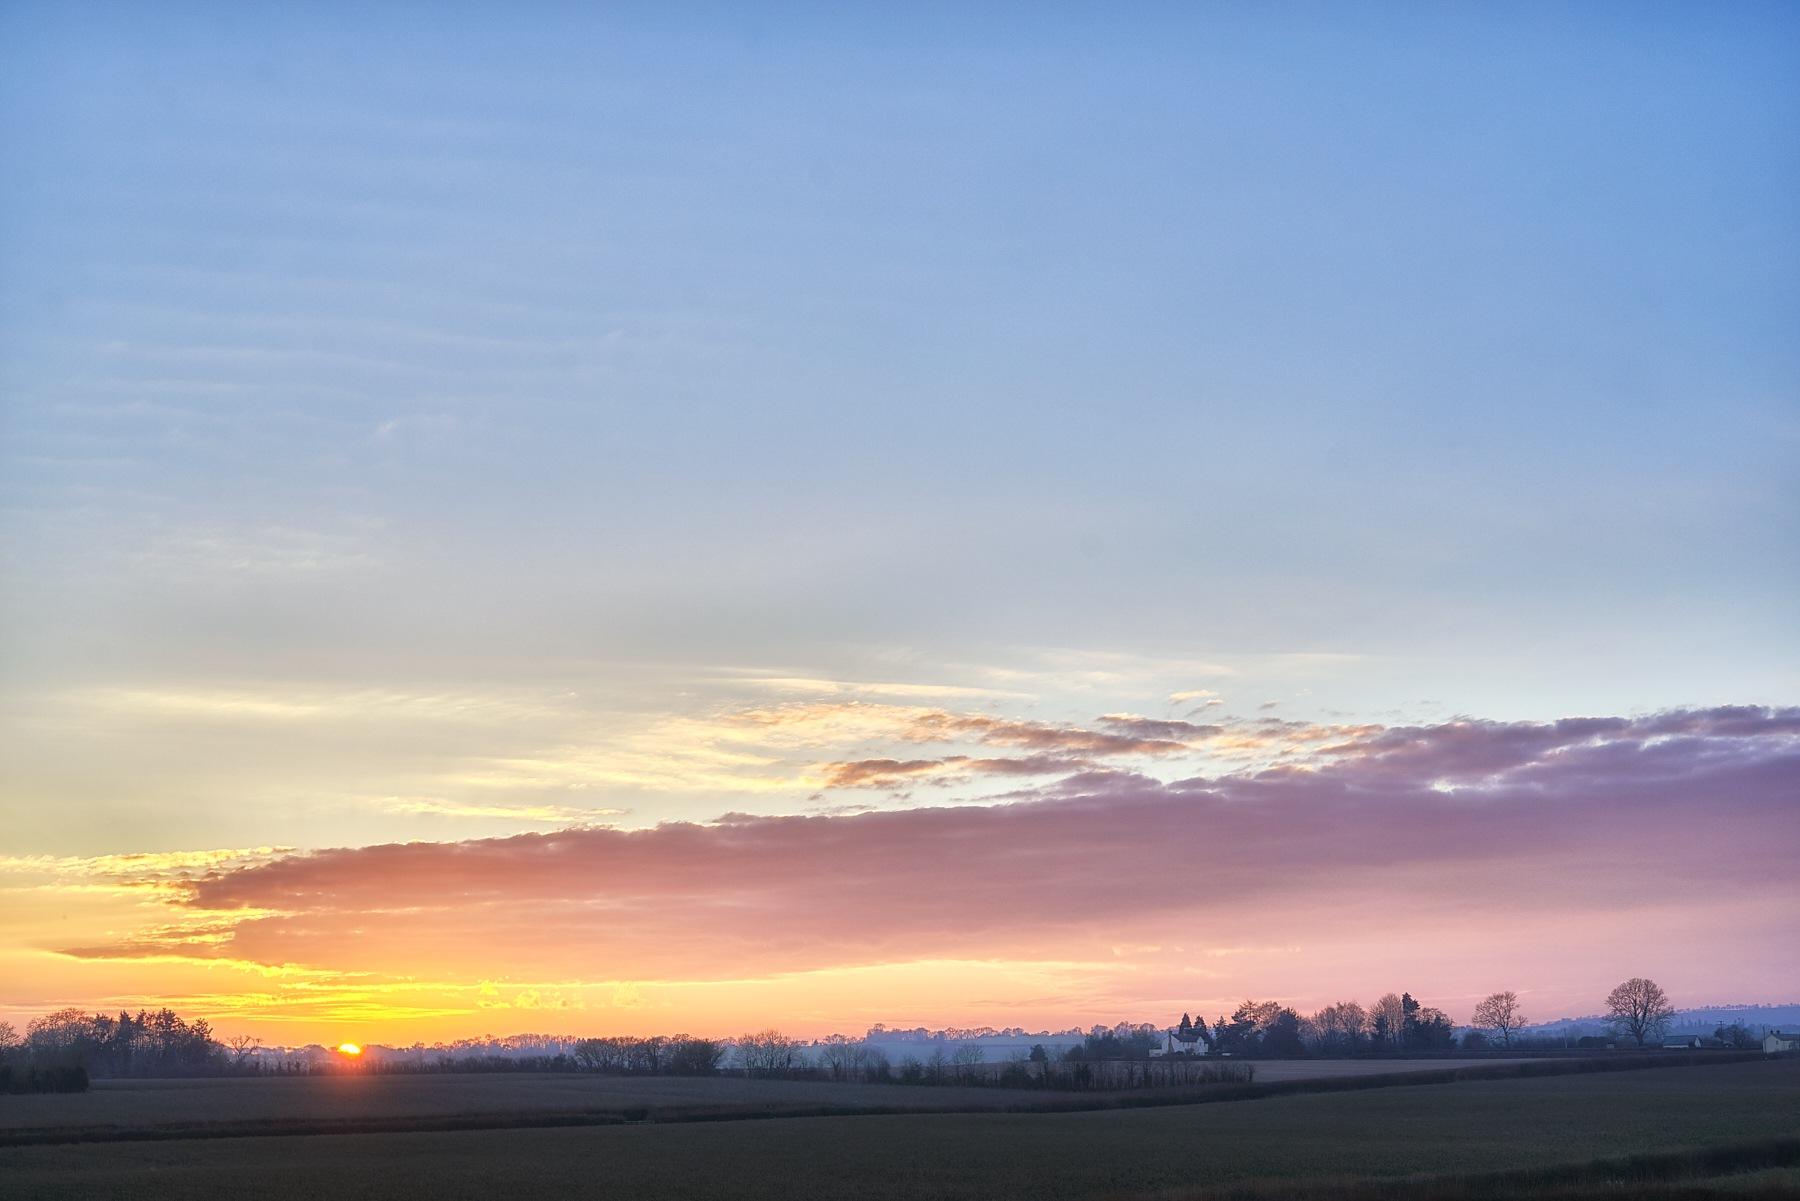 Sunset by Ian K. Iles